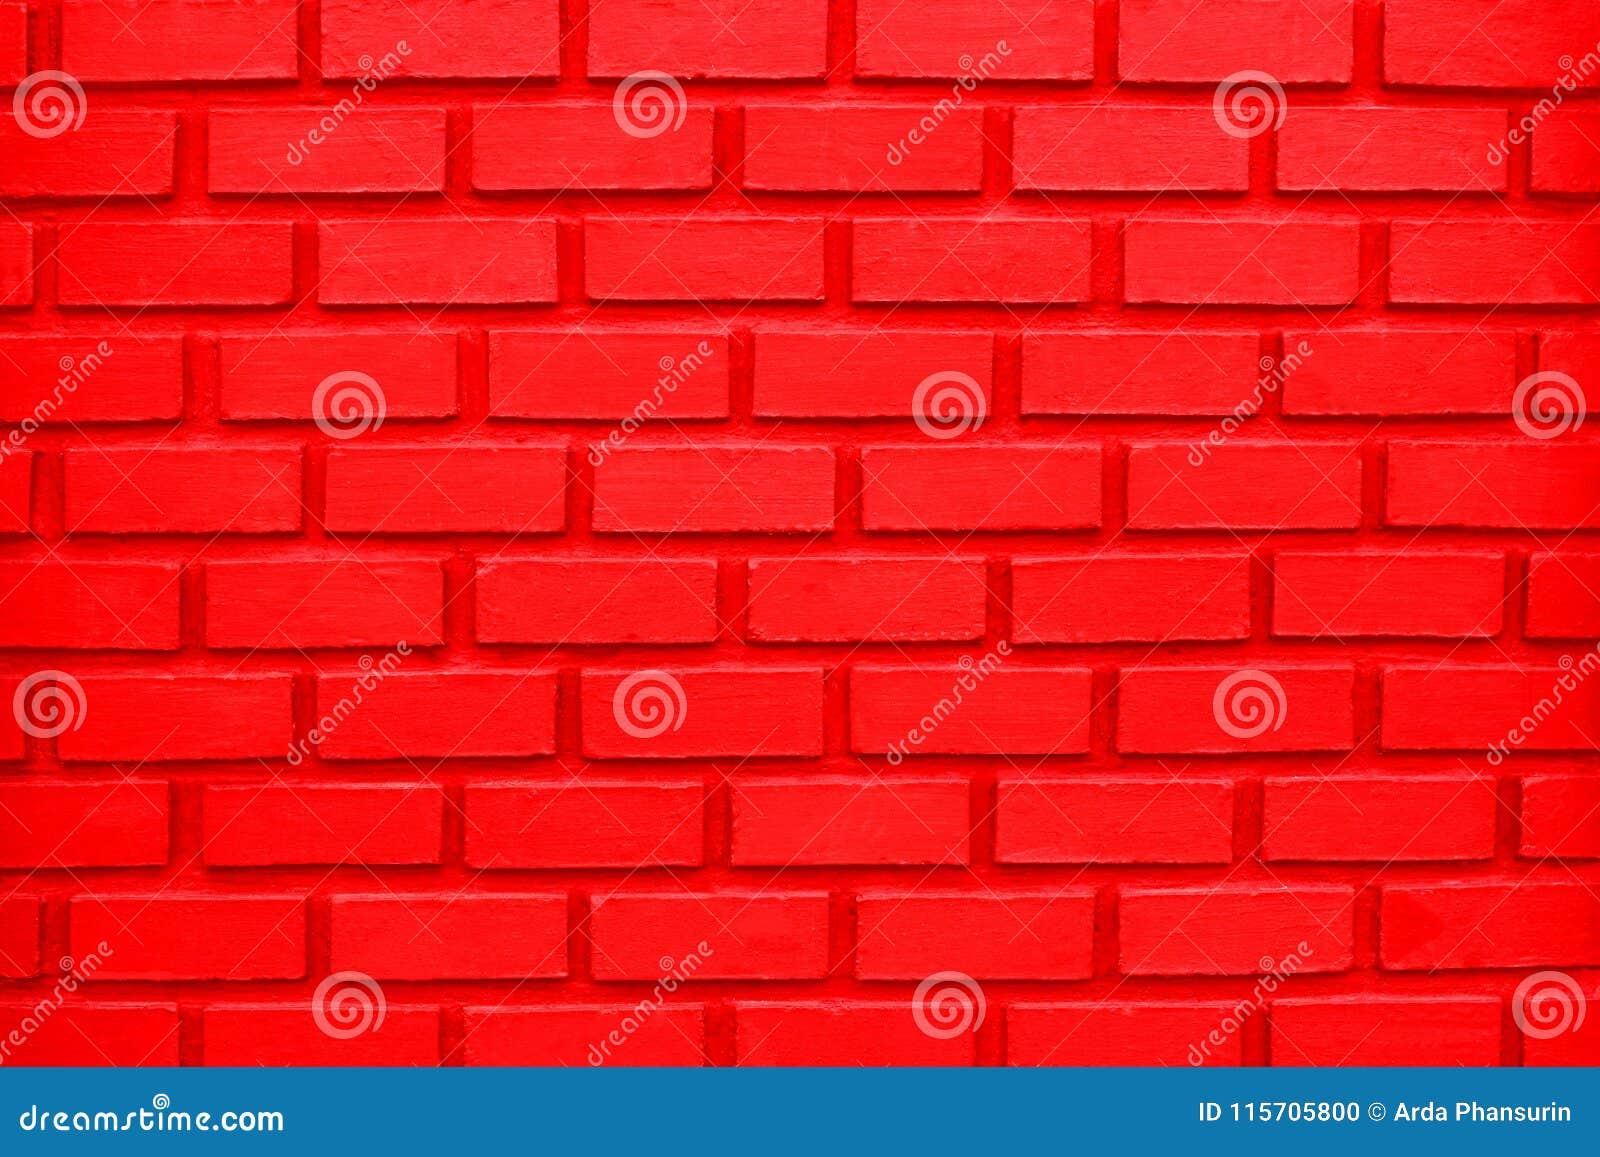 Fondo rojo colorido de la pared de ladrillo O fondo rojo colorido de la pared de ladrillo